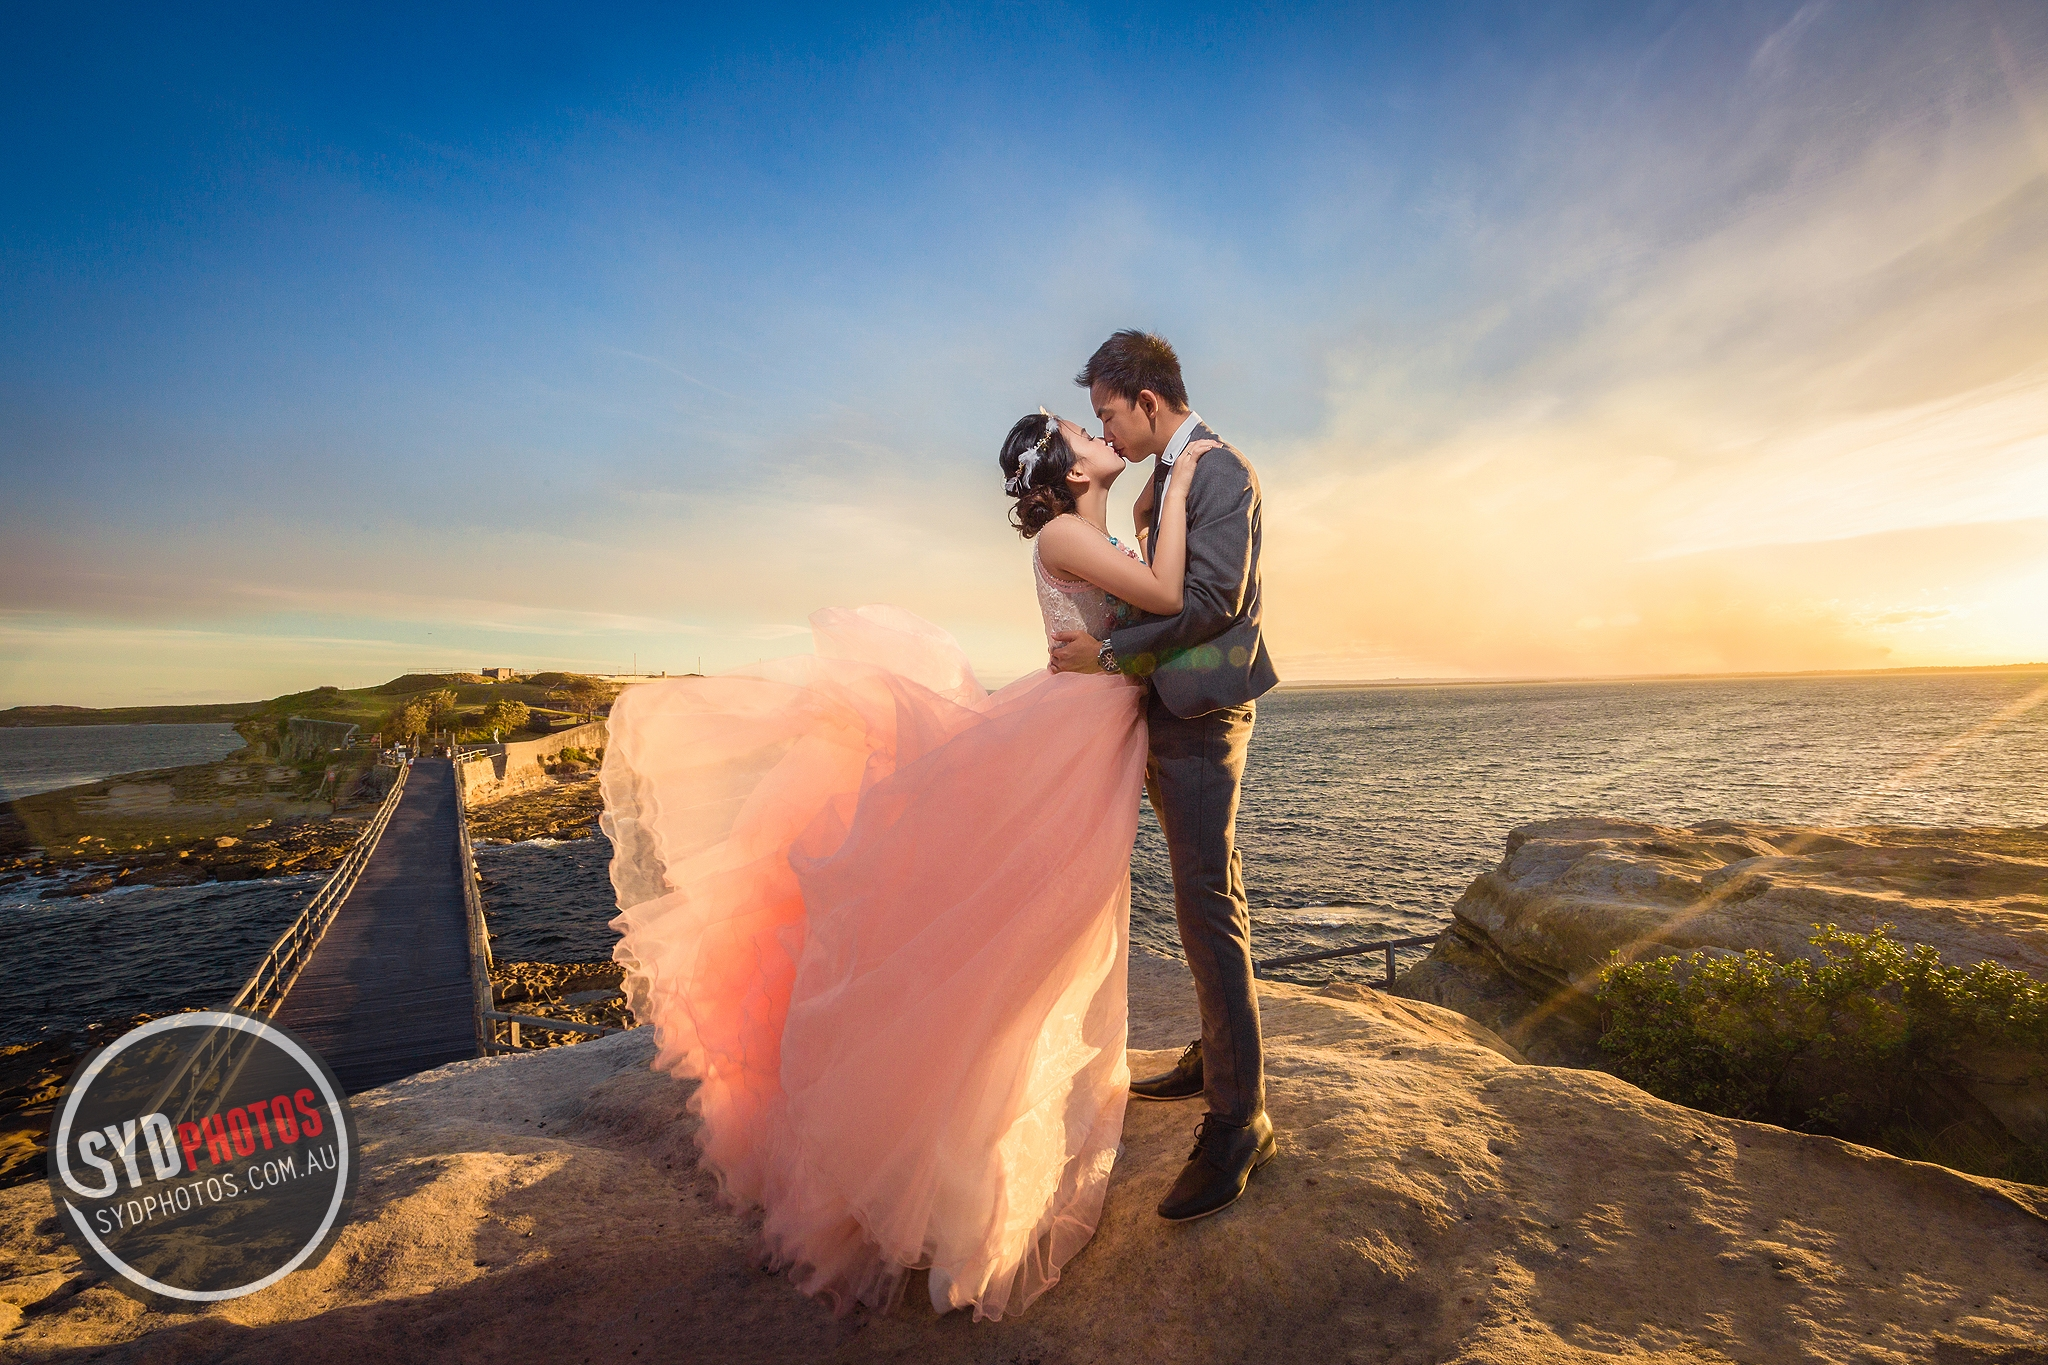 ID-100482-Vinnytina-Prewedding-悉尼婚纱摄影